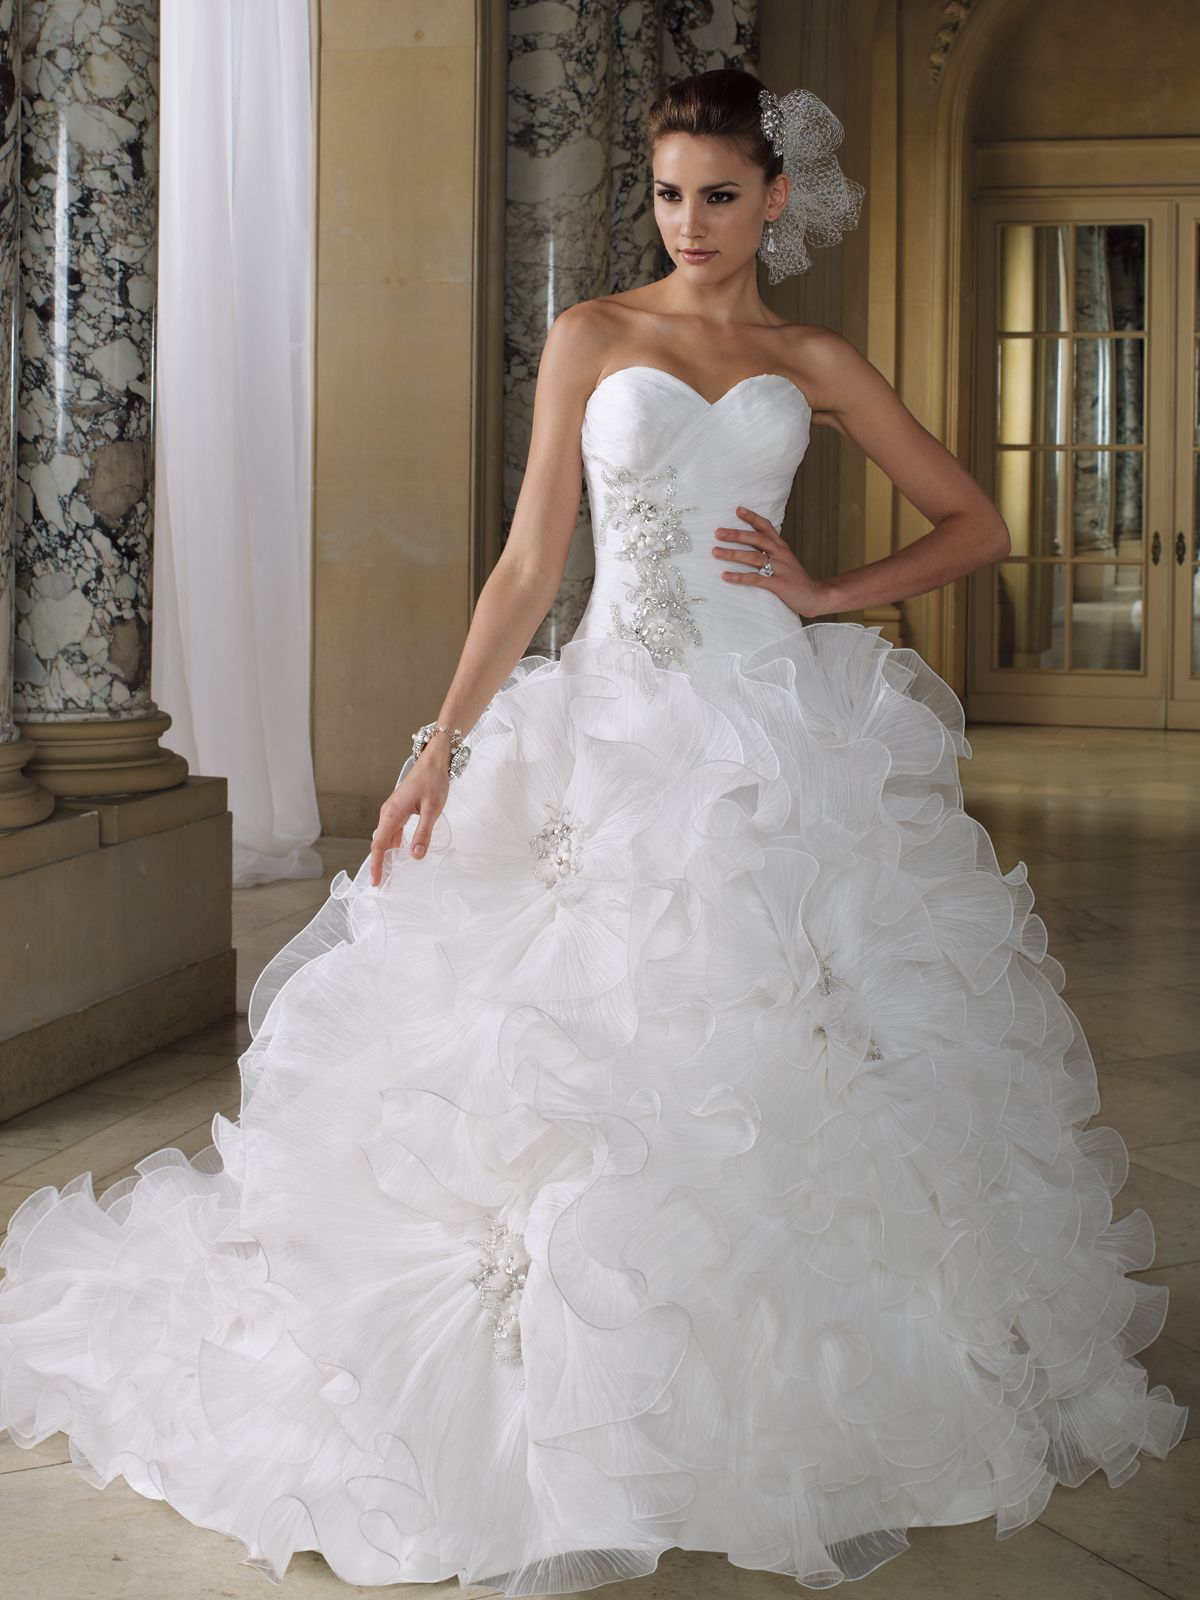 David wedding dress   This Wedding dress by David Tutera for Mon Cheri Affordable